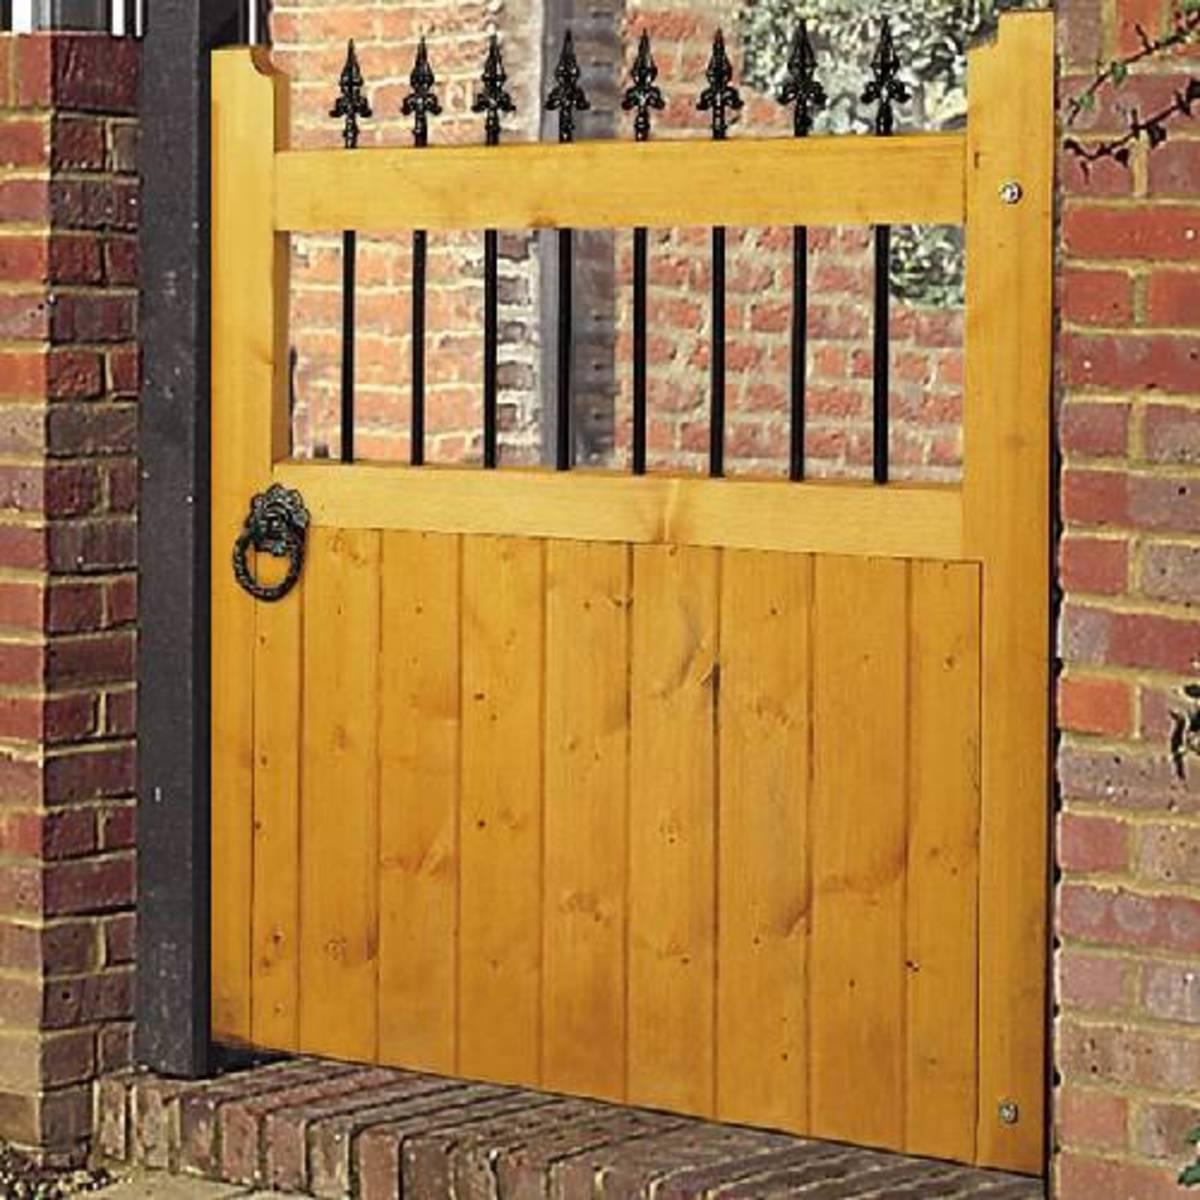 Wooden gates - Single wooden gates - Vertifleur gate